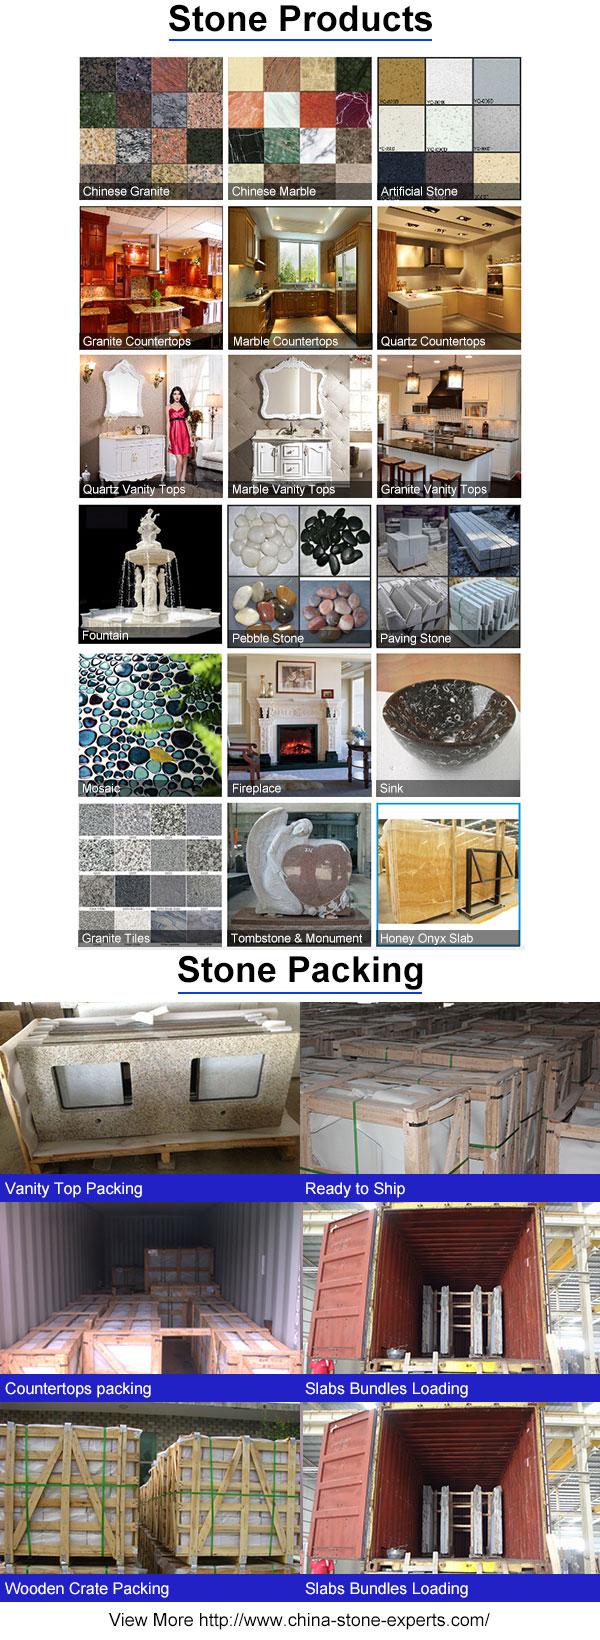 Yeyang Stone Products+Packing-2.jpg